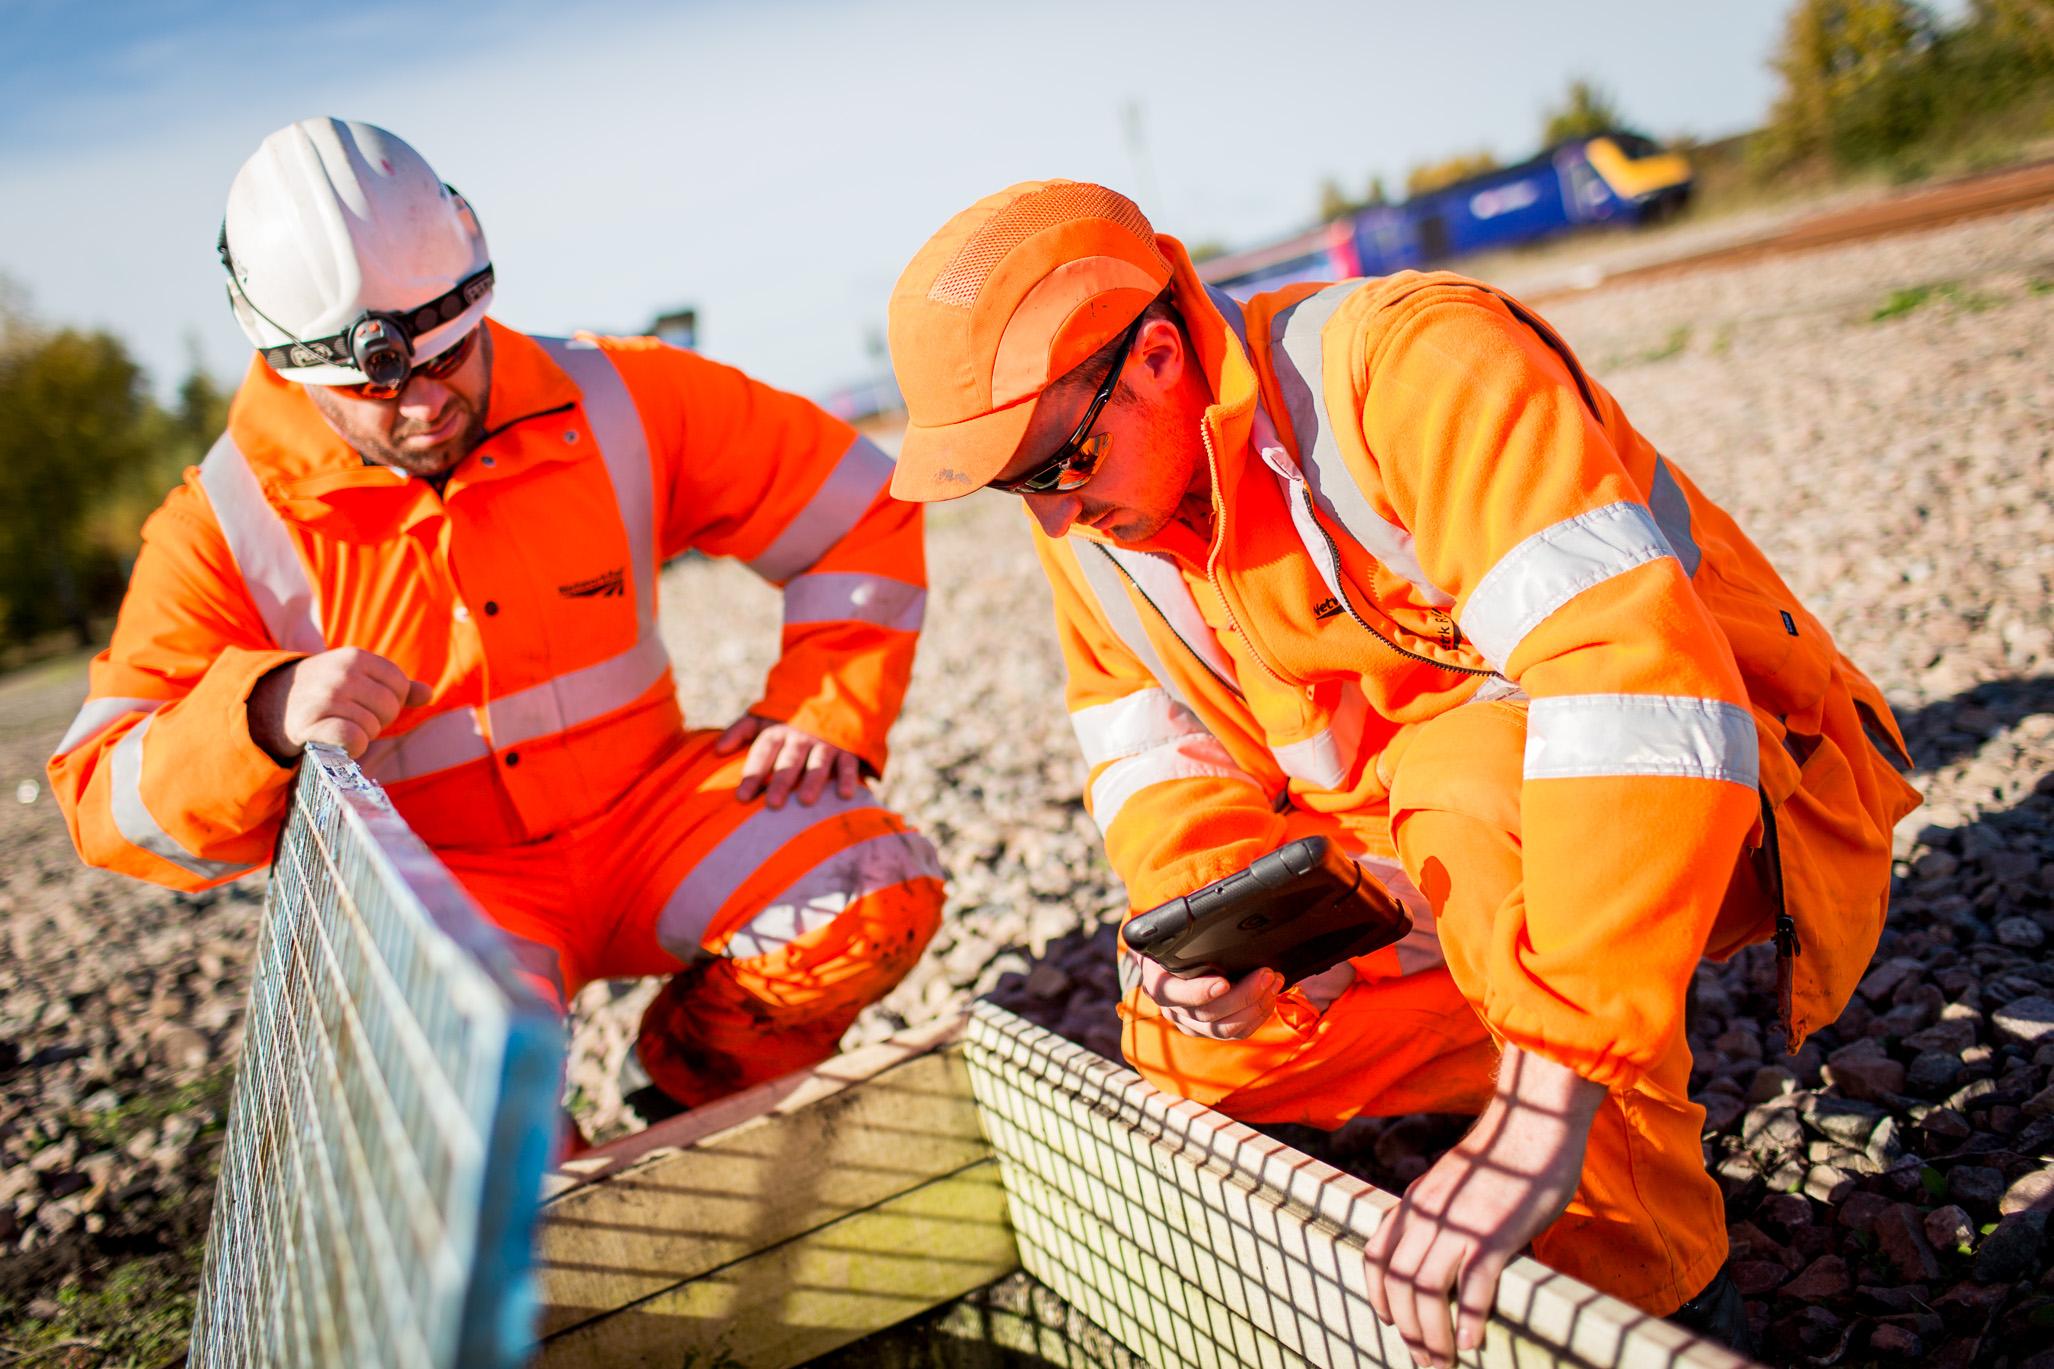 Rail upgrade work for Network magazine